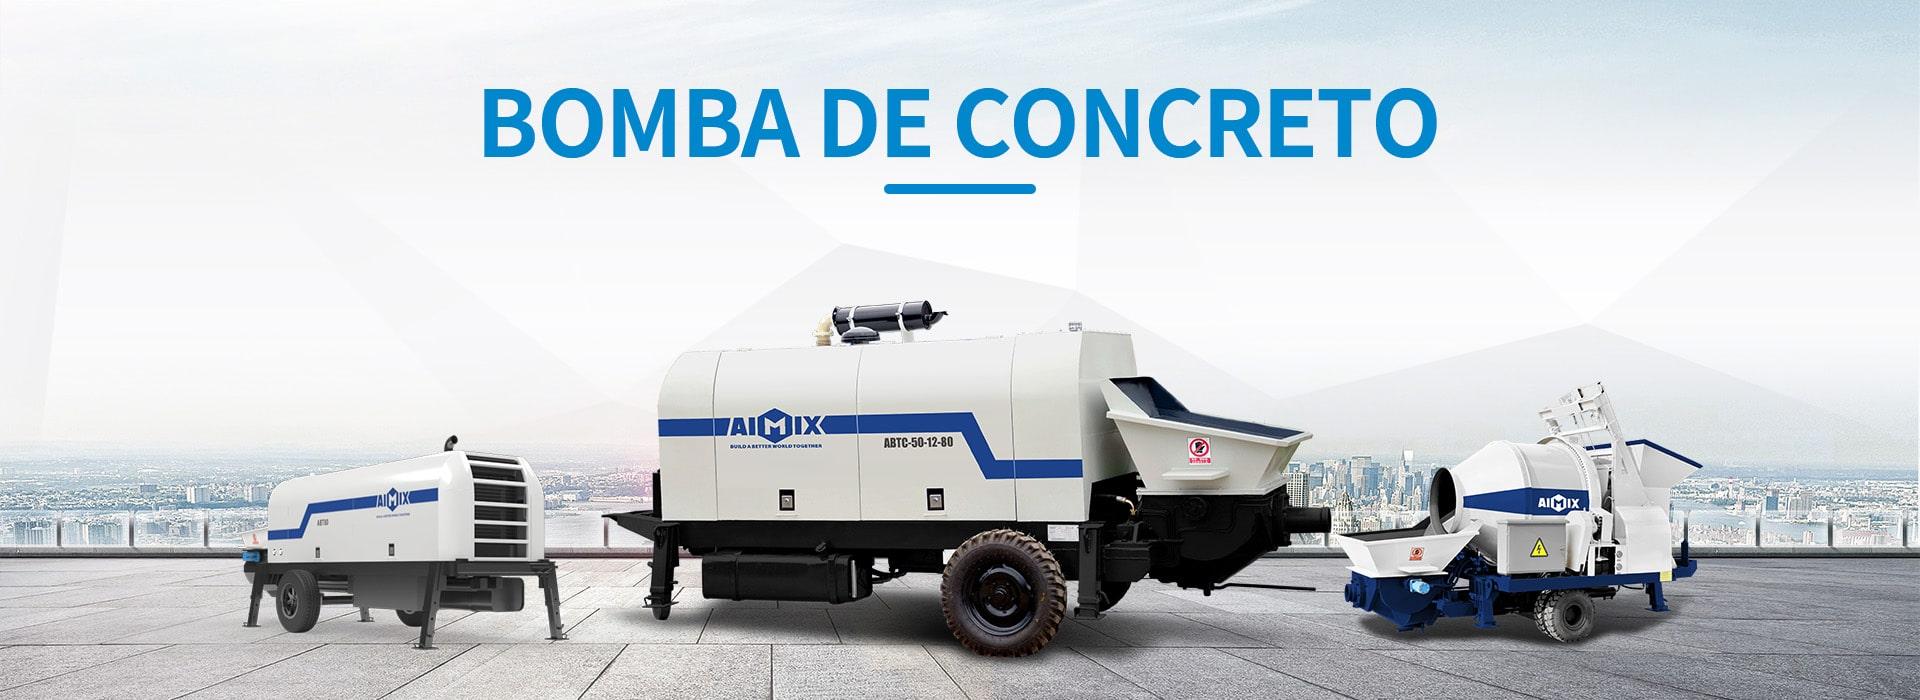 Venta De AIMIX Bomba De Concreto